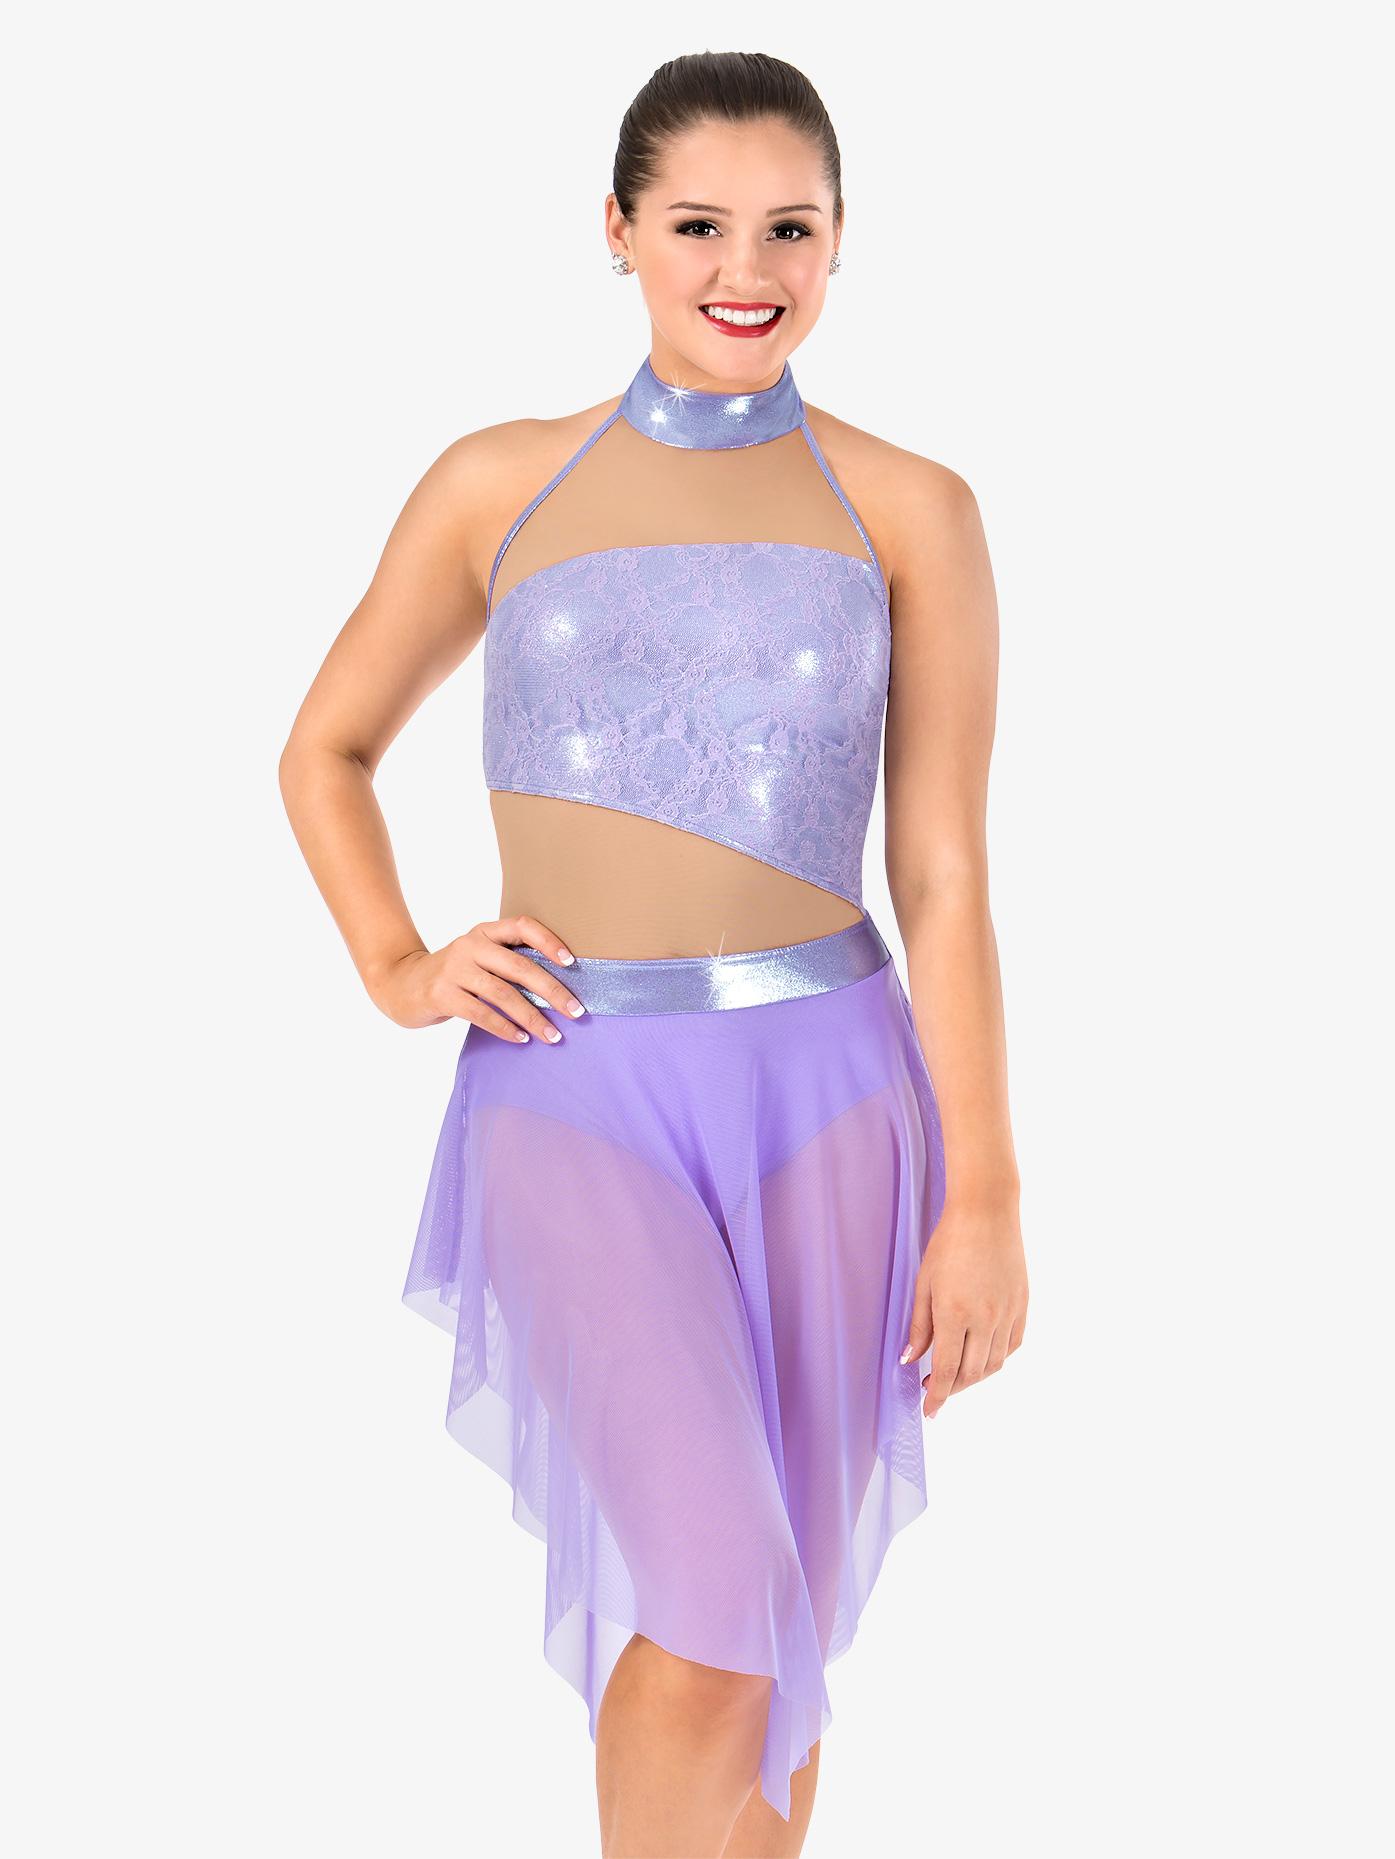 Elisse by Double Platinum Womens High Neck Metallic Lyrical Dress N7476